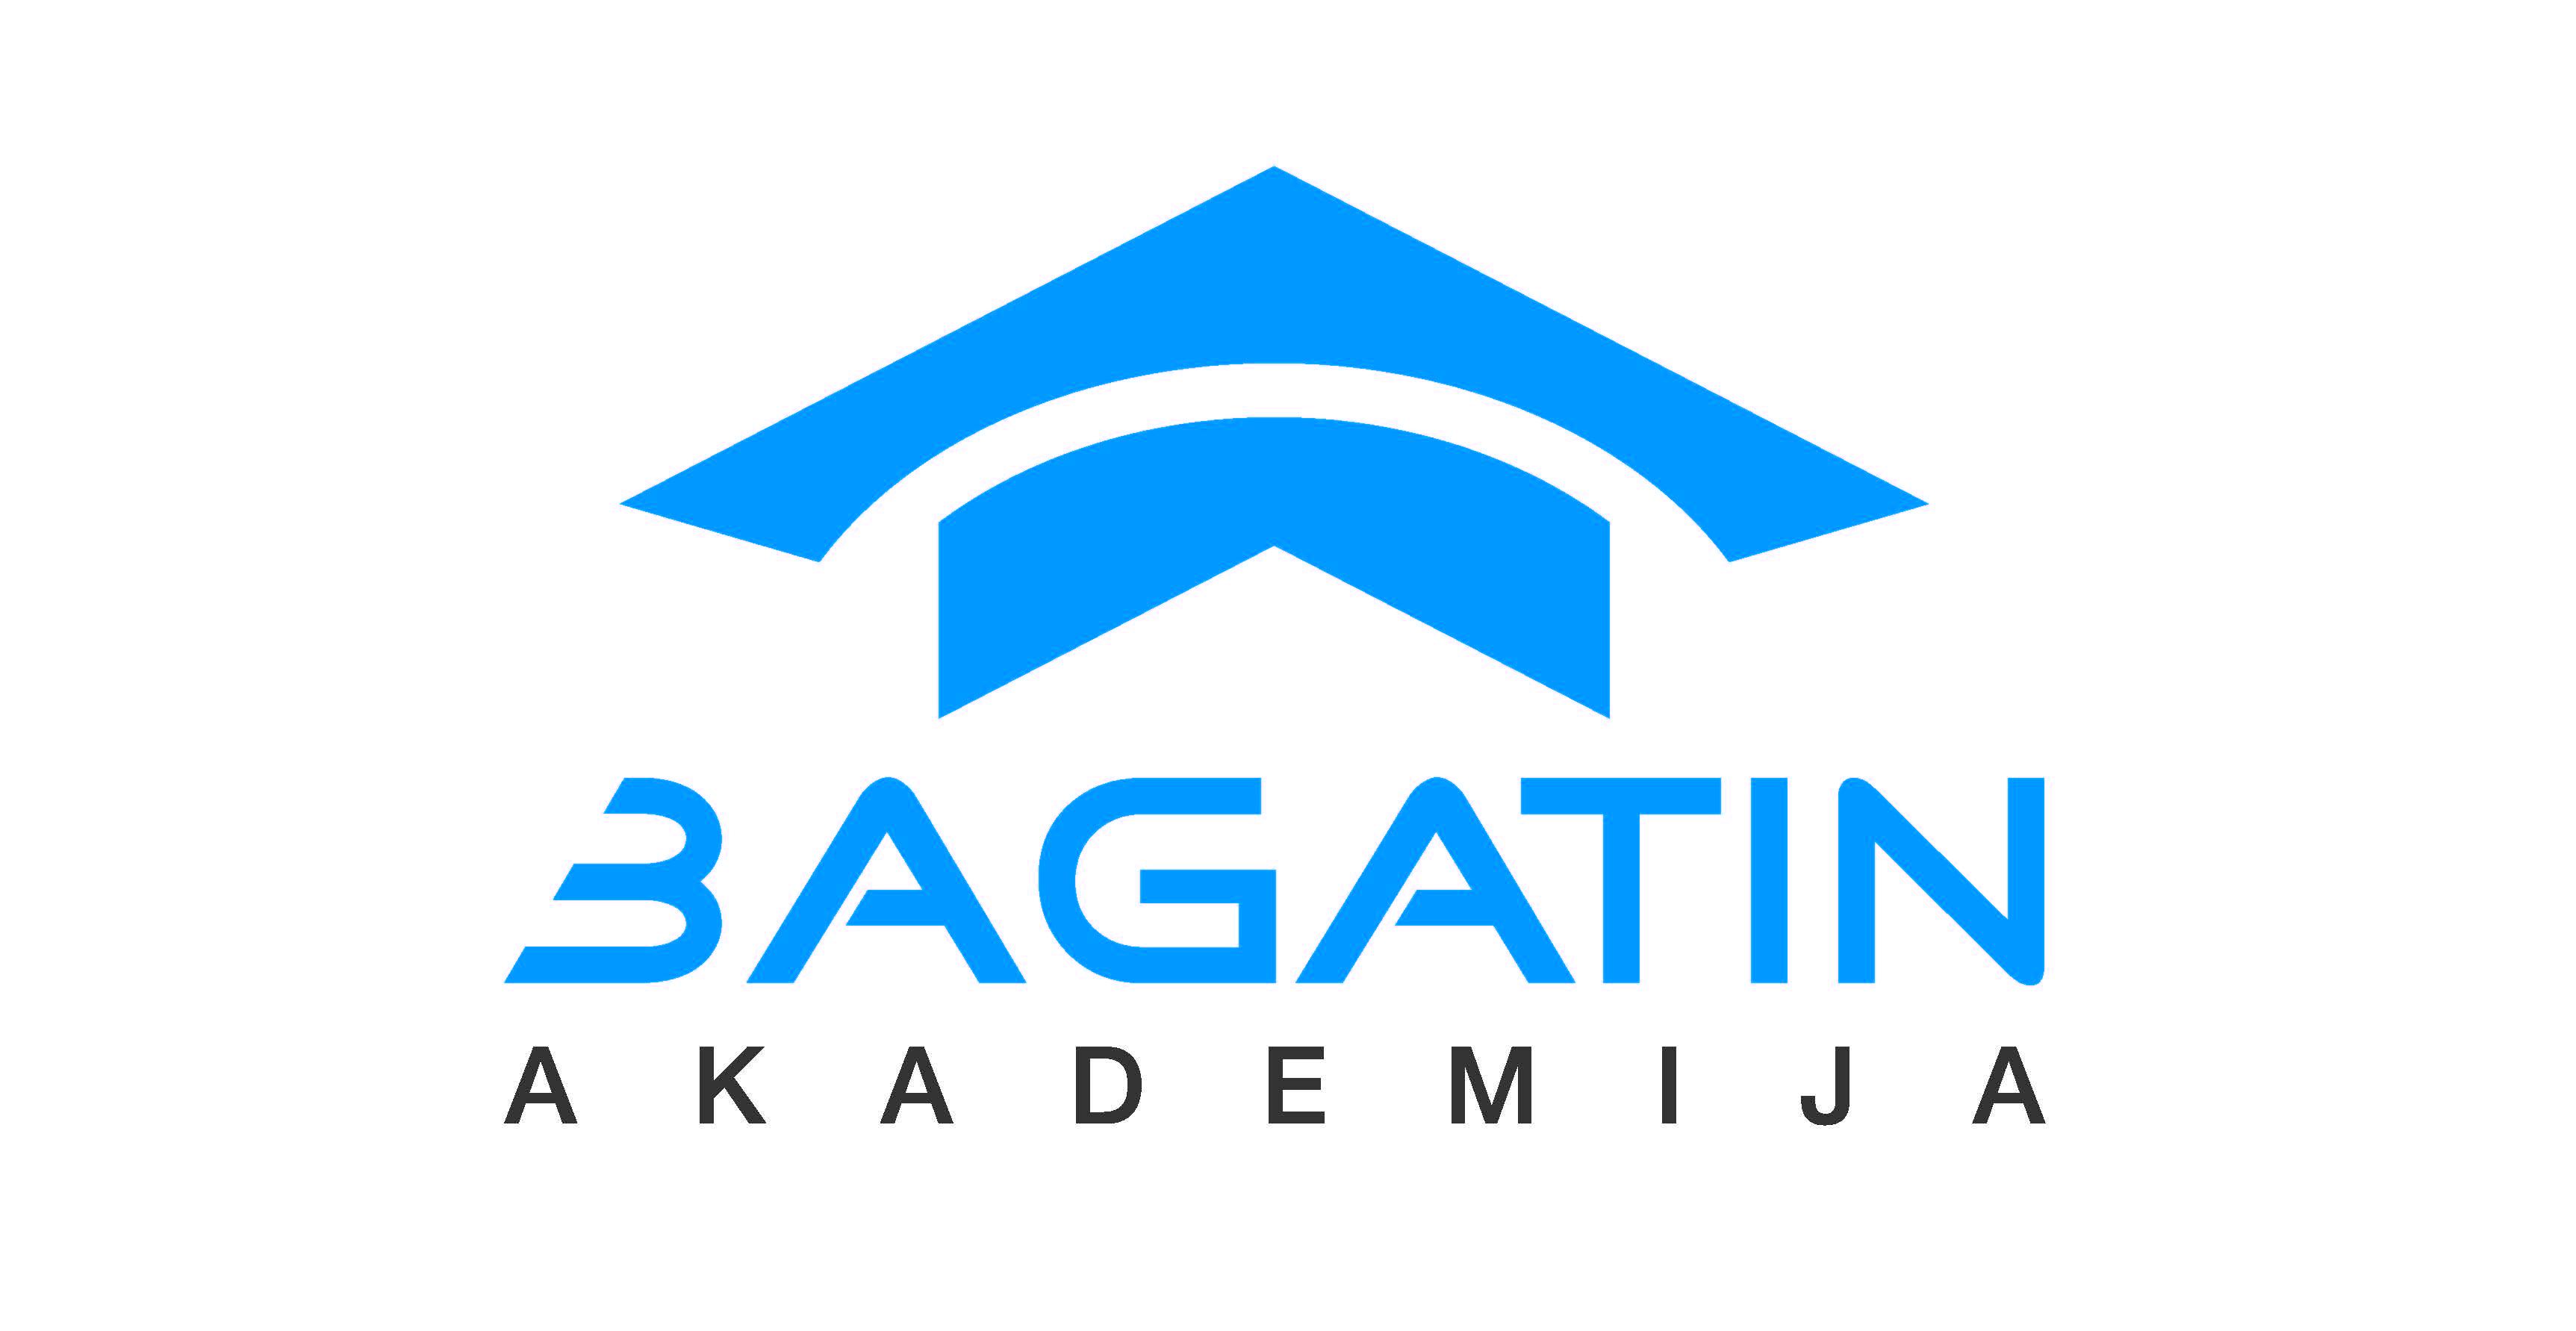 Bagatin akademija